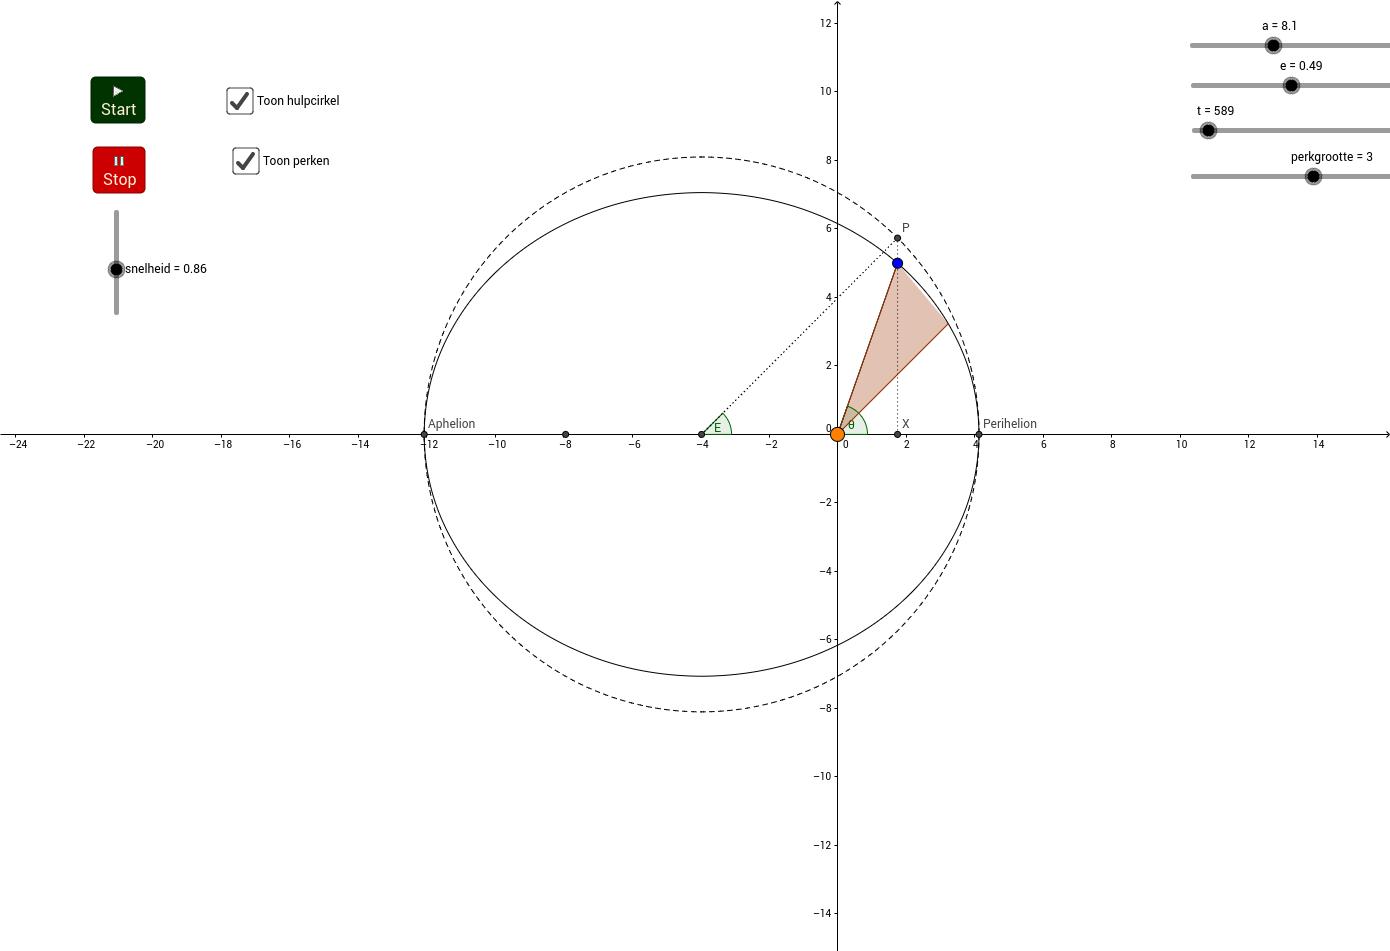 Planetary Orbit by Kepler